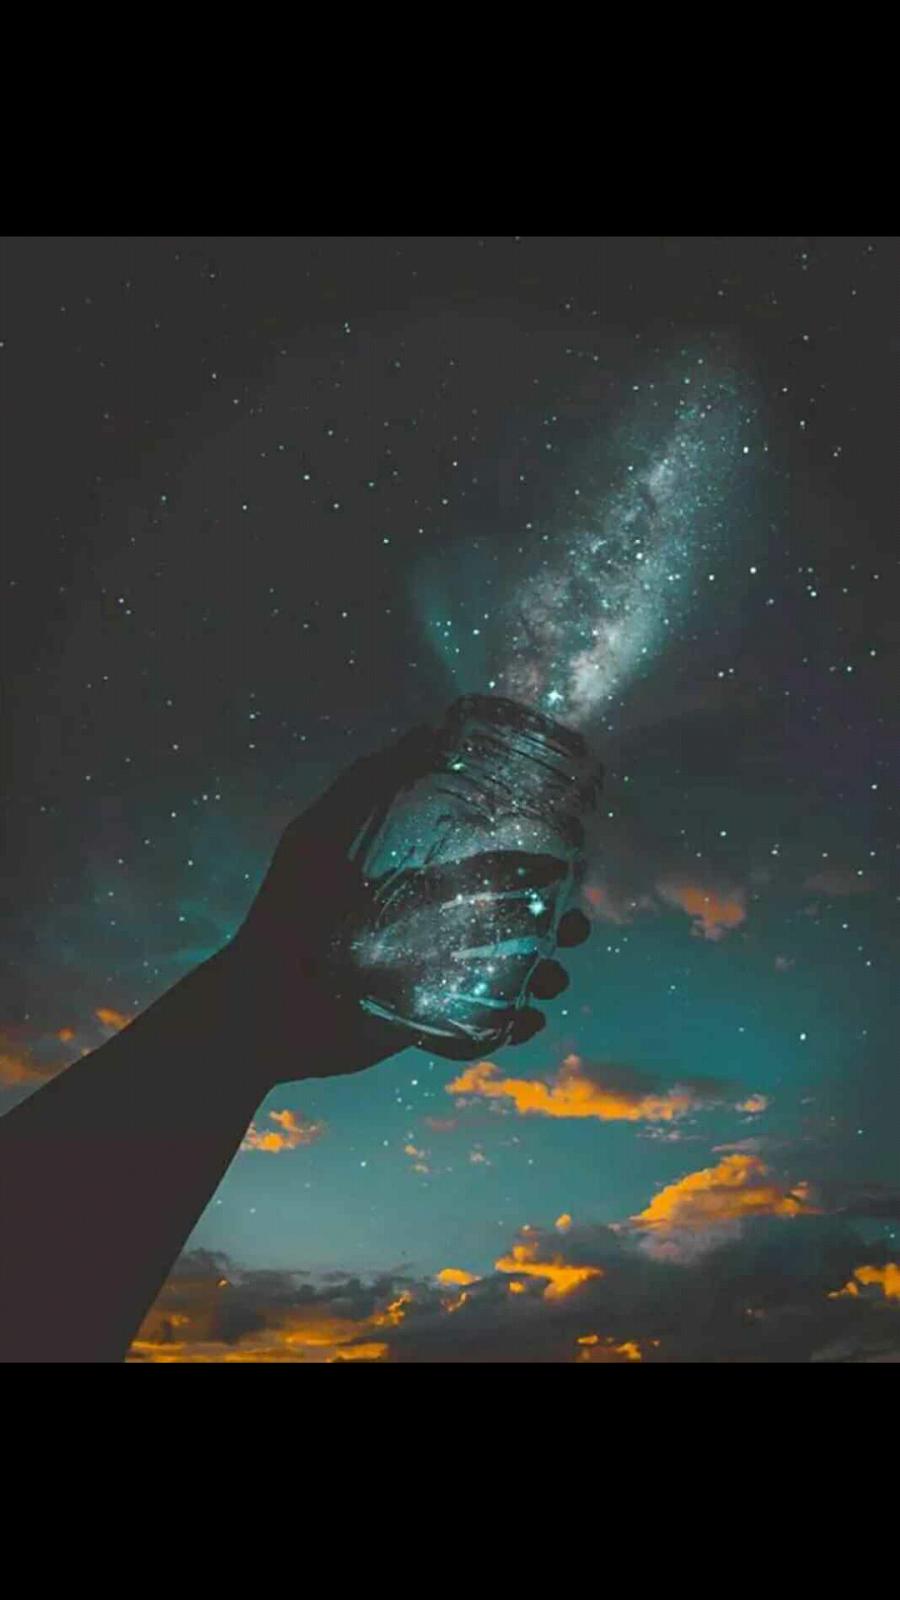 MyBlogForYou: 5 Background Pemandangan Langit Dan Bintang